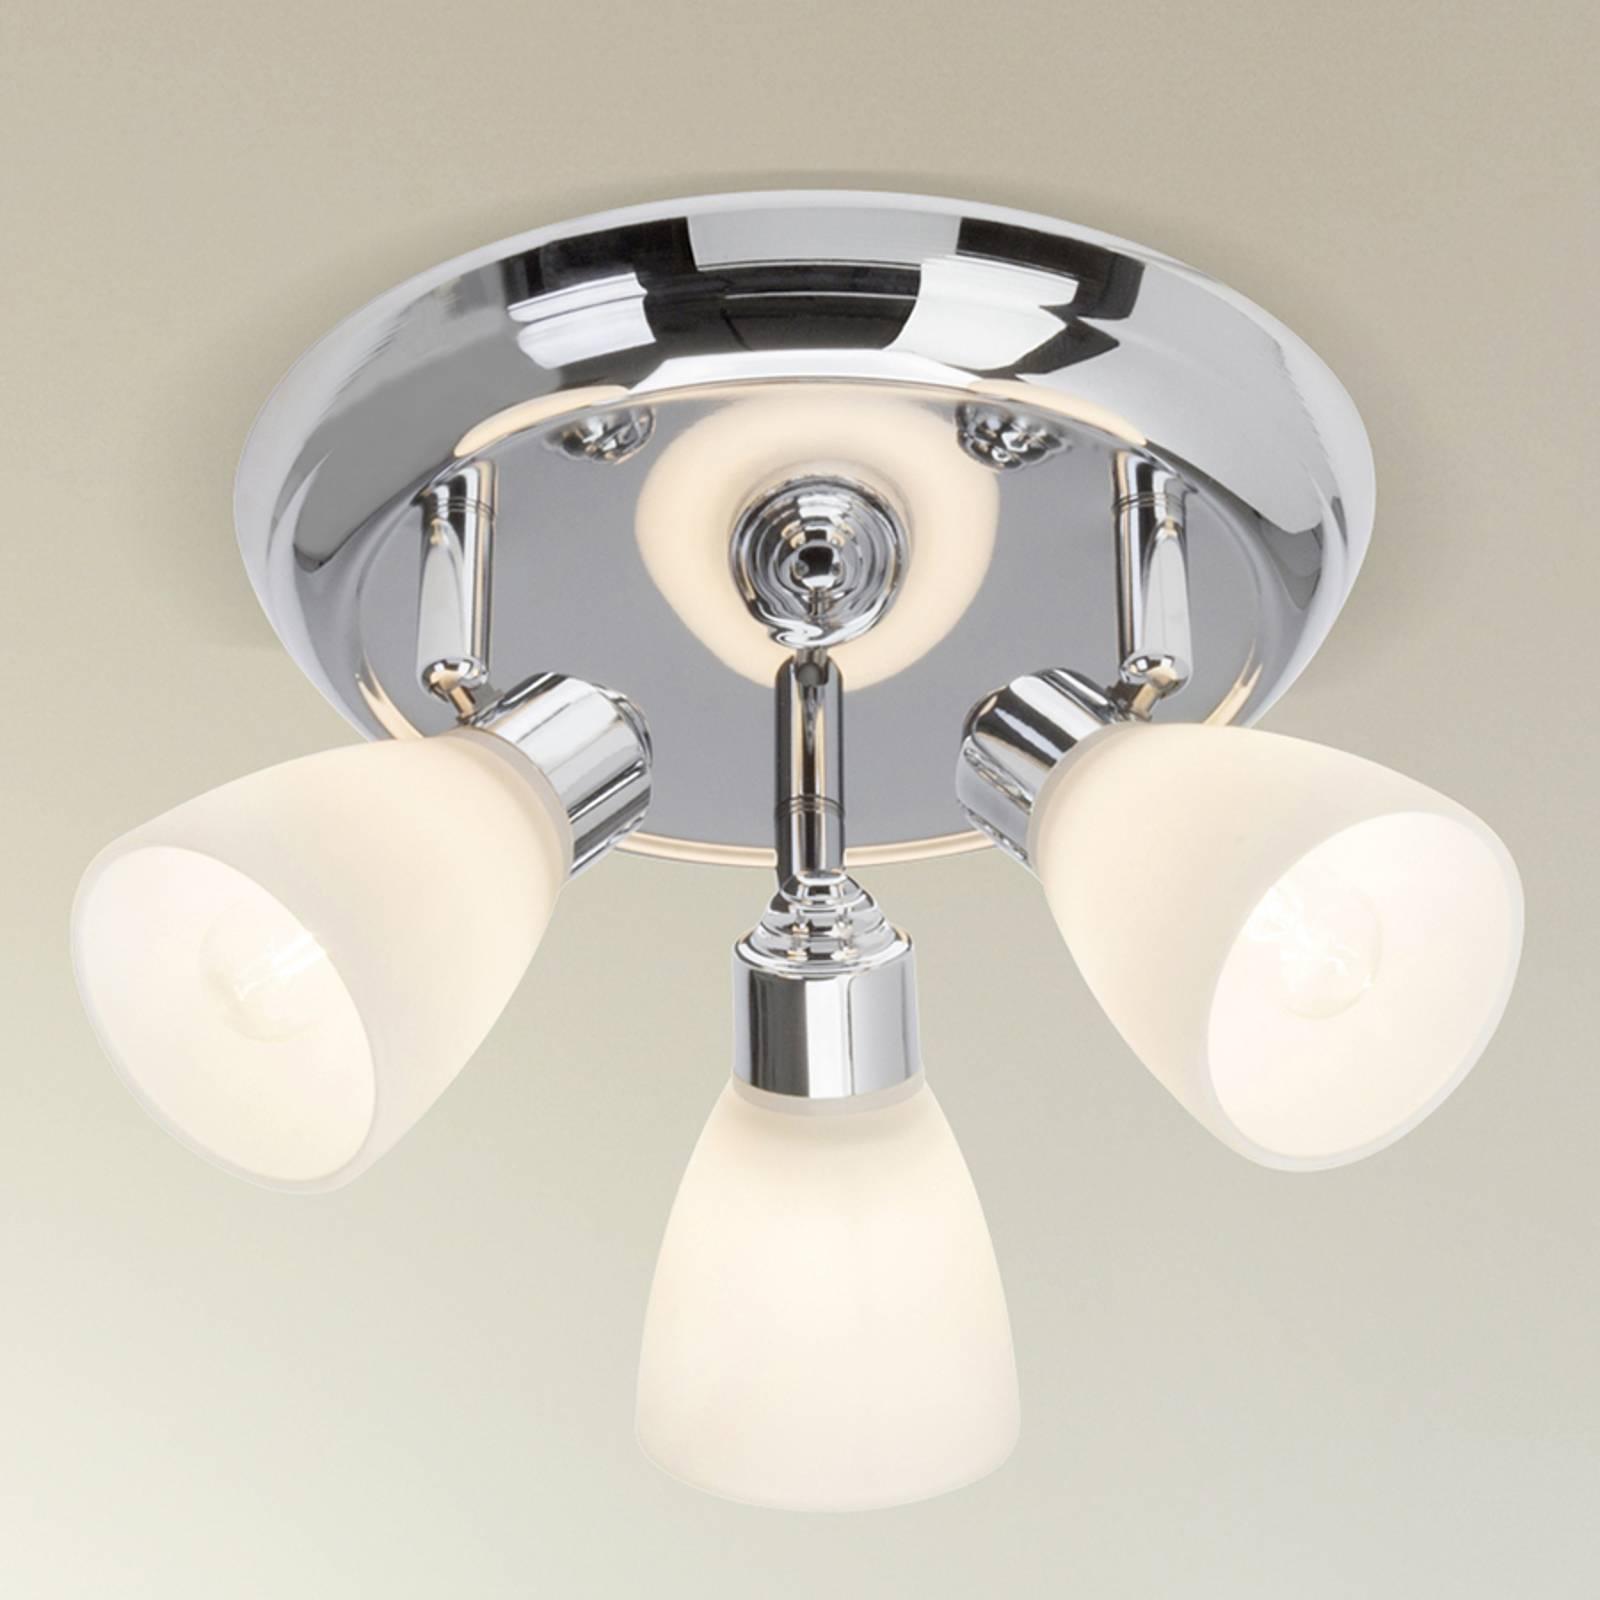 Kensington - drieflammige plafondlamp, chroom